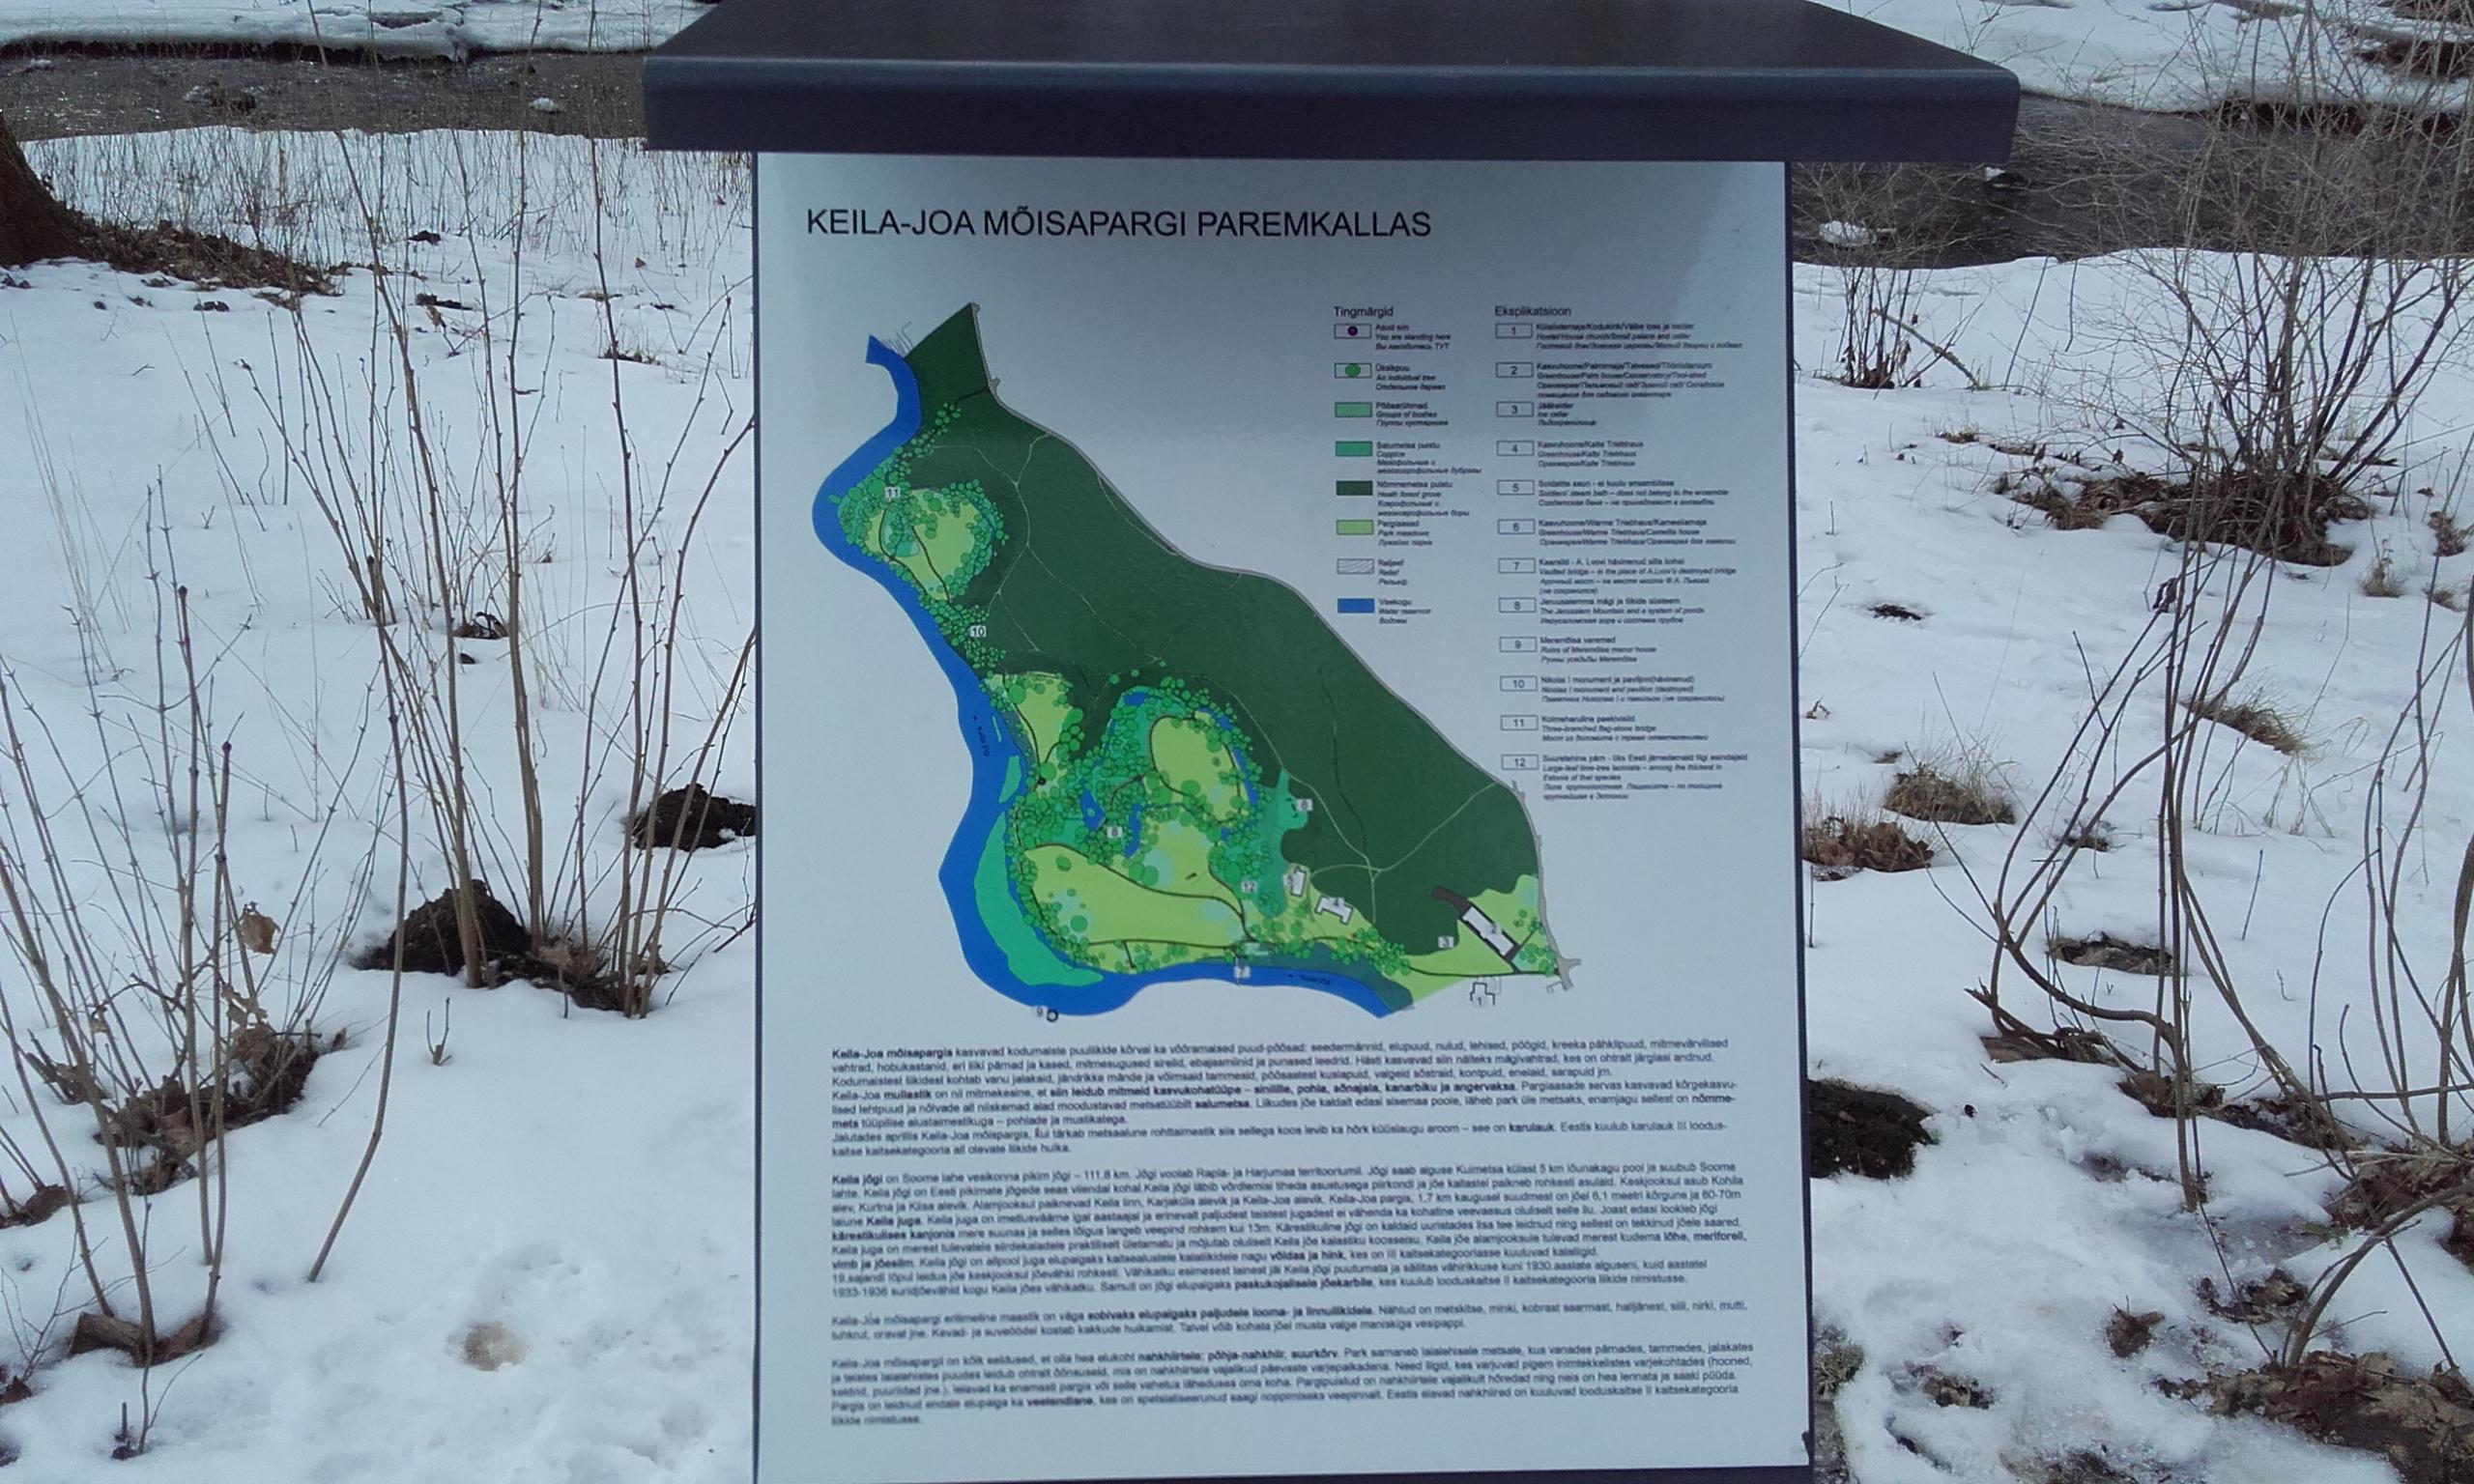 Mapa del parque de Keila-Joa